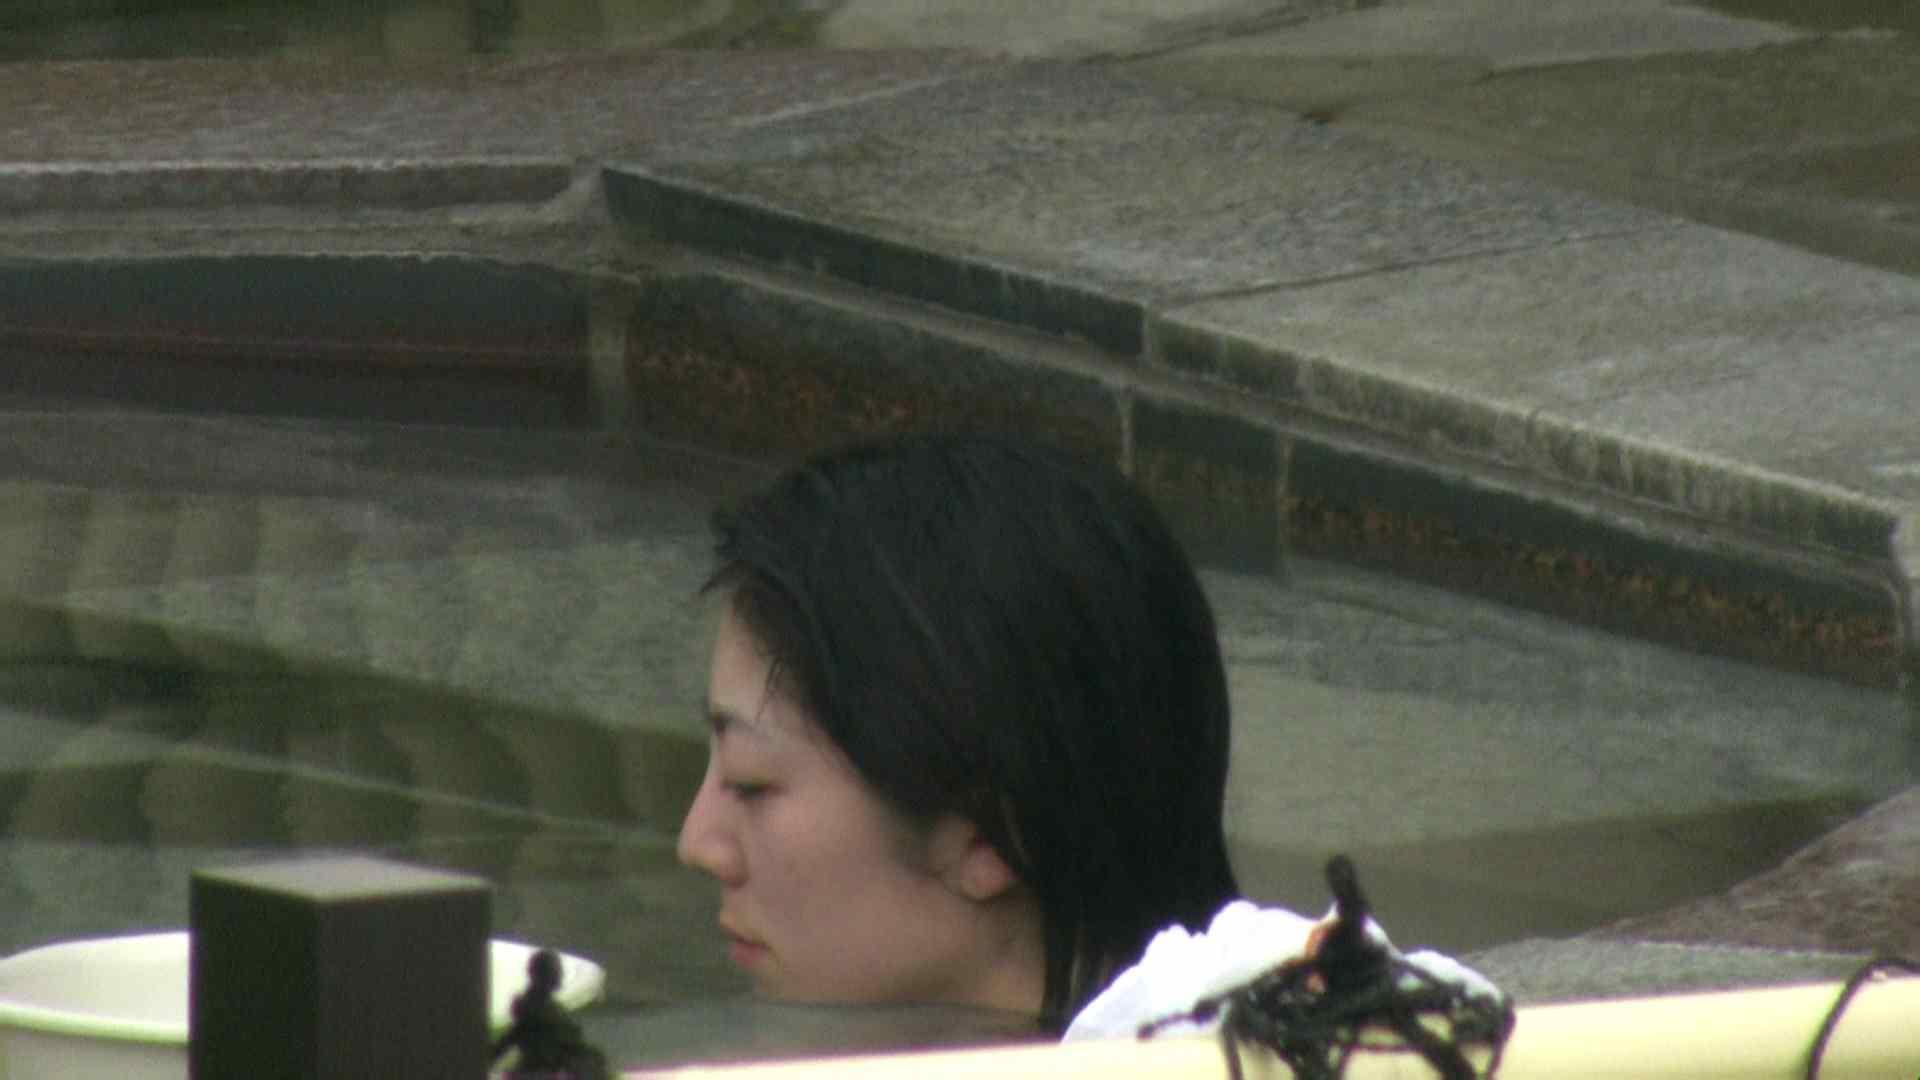 Aquaな露天風呂Vol.04 露天風呂編  94PIX 86